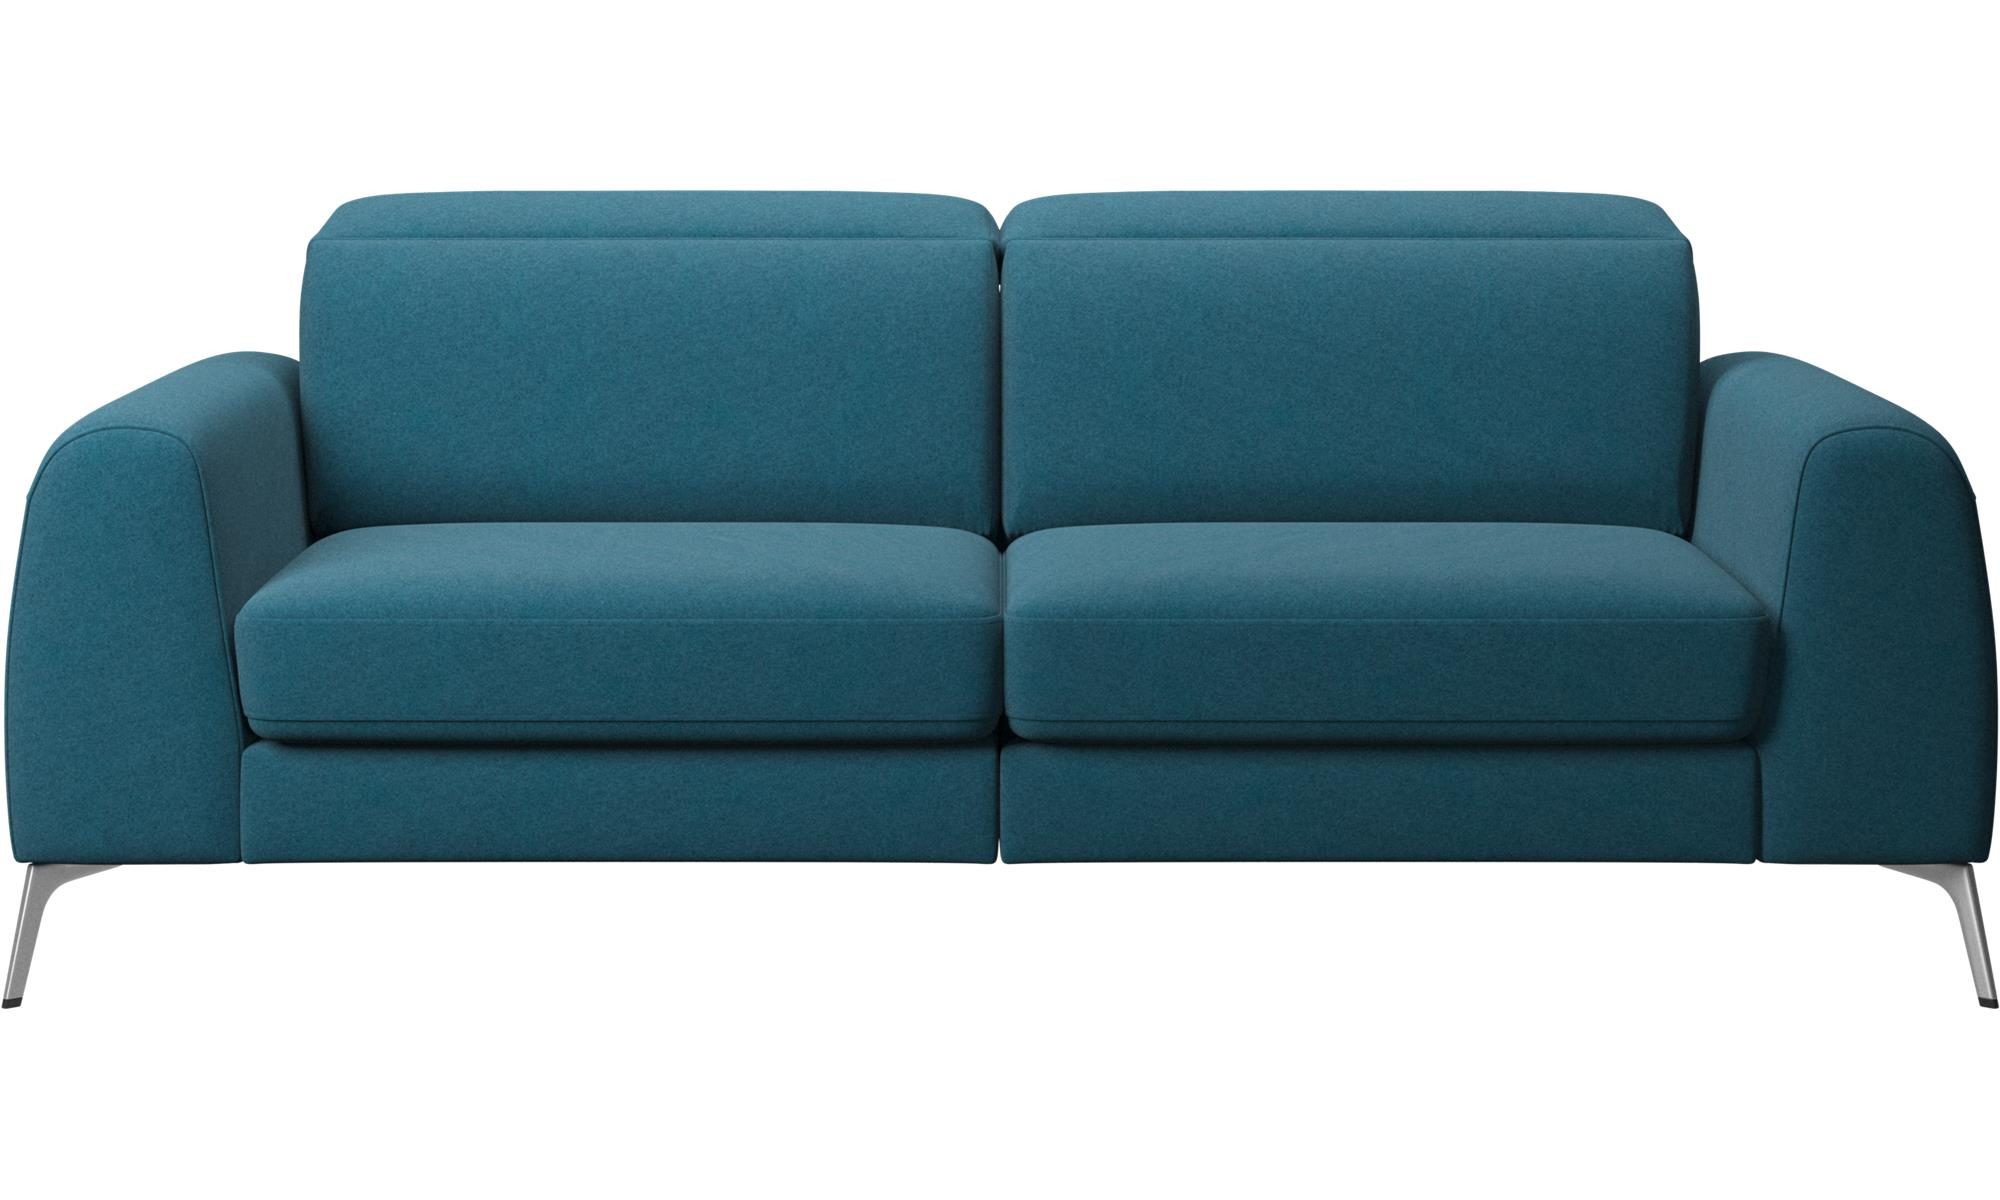 kopfsttze sofa boconcept schlafsofa with kopfsttze sofa cool cheap cheap kissen triangle. Black Bedroom Furniture Sets. Home Design Ideas